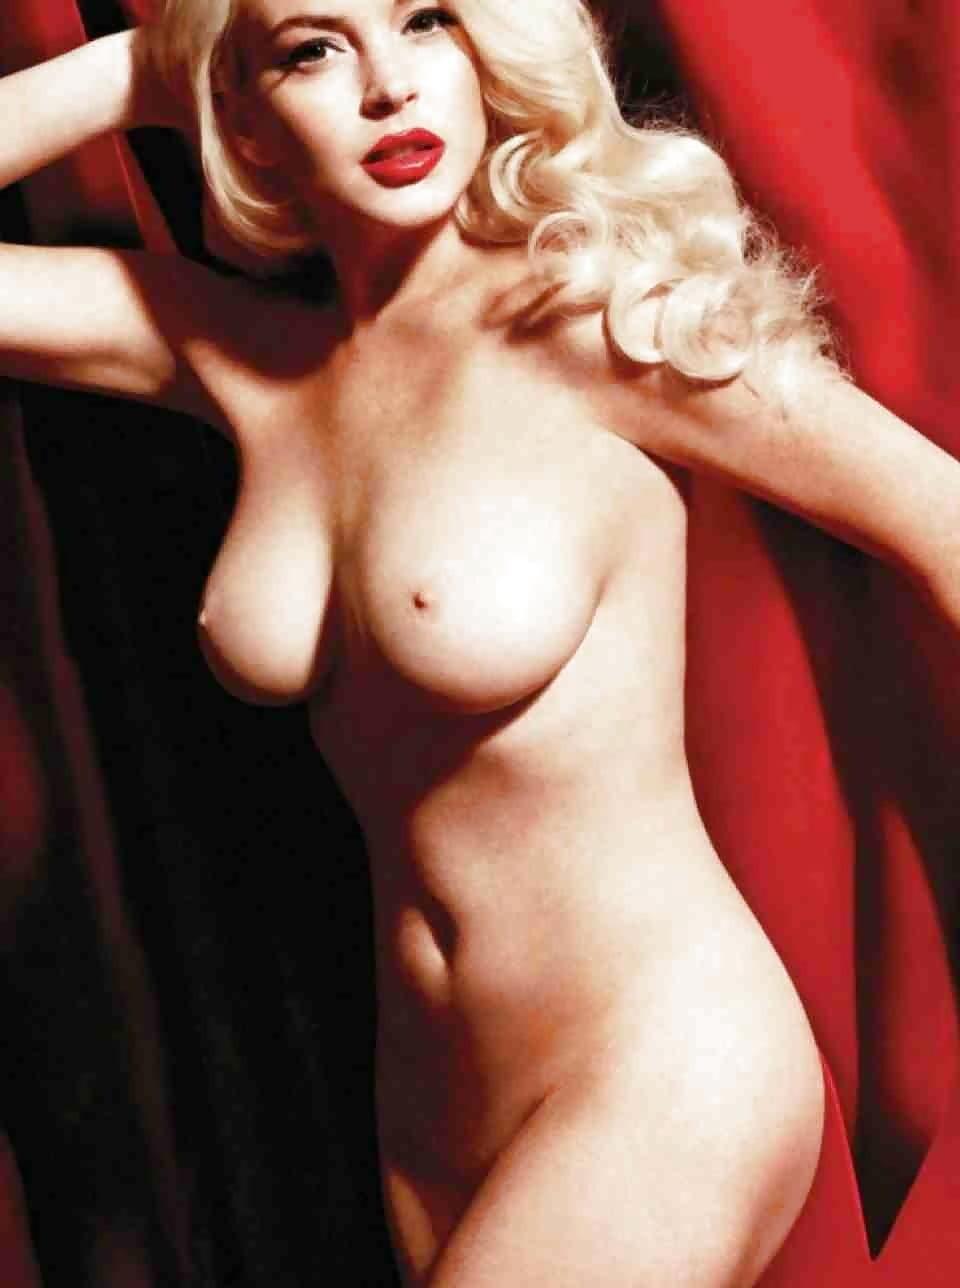 Lindsay lohan new york magazine mint new marilyn monroe nude pictorial